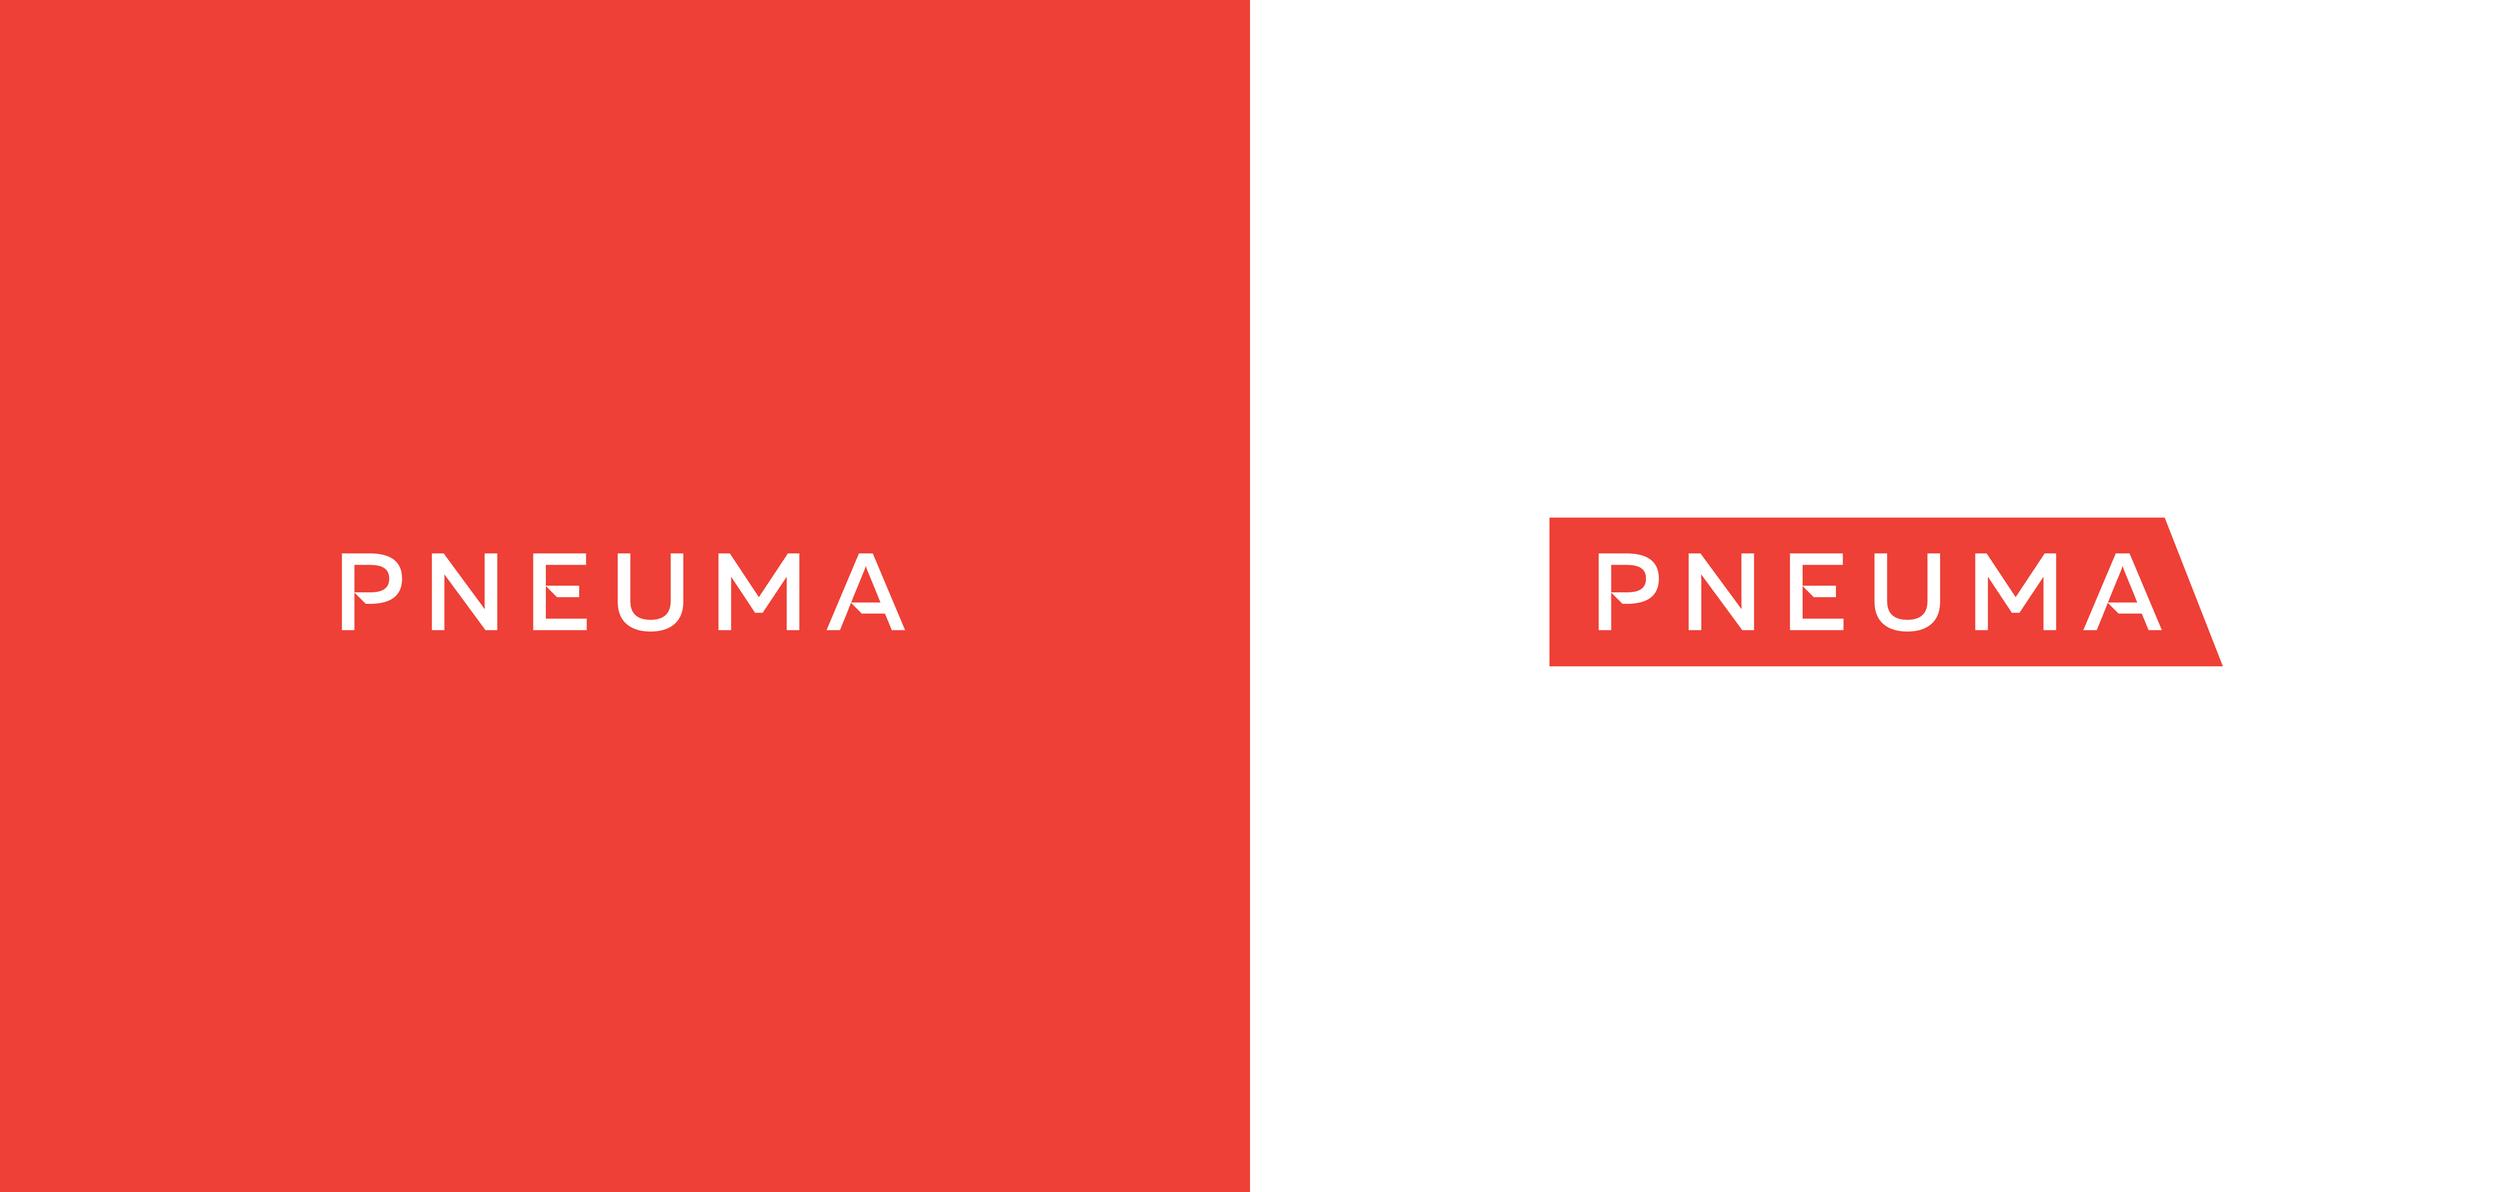 pneuma-logo-integrity-01.png